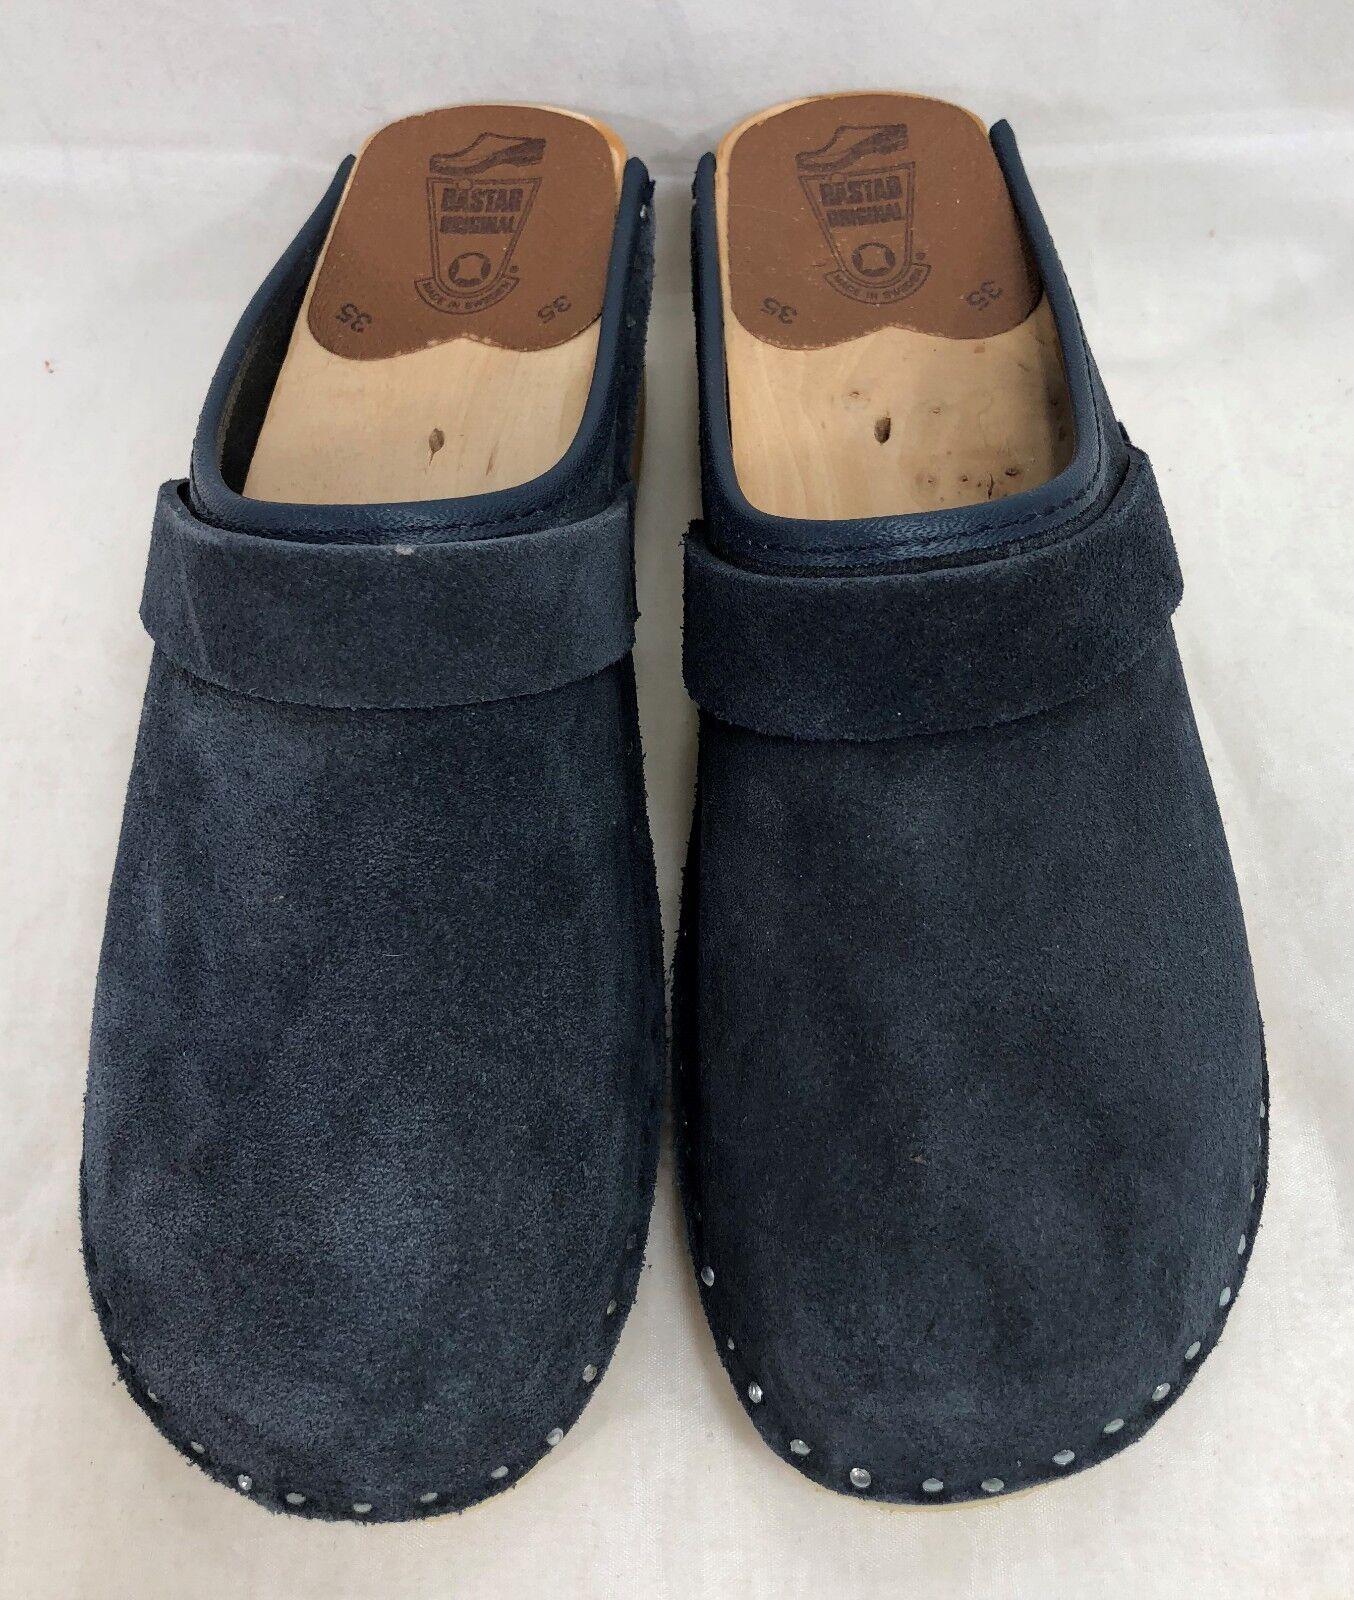 Troentorp Bastad Swedish Clogs Suede Suede Suede Blau Leather Größe 35 US 4-4.5 3a1f1a